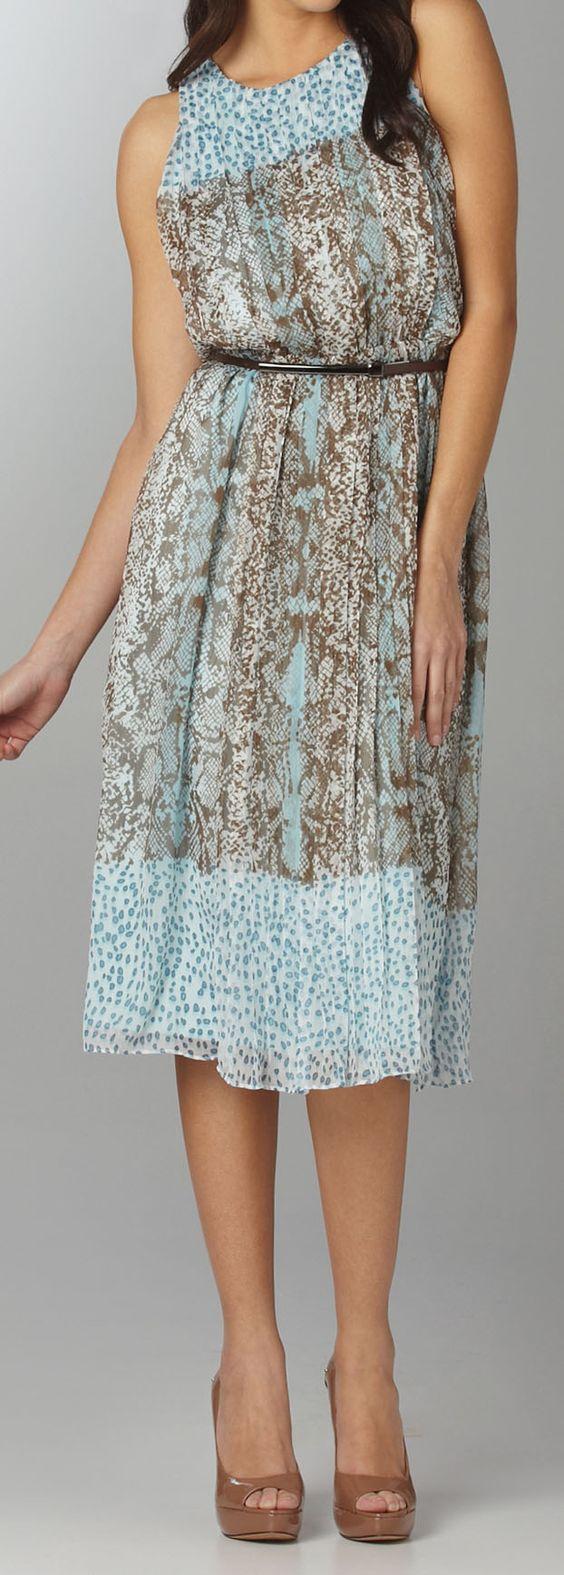 Adorable print dress with an edge - snakeskin!